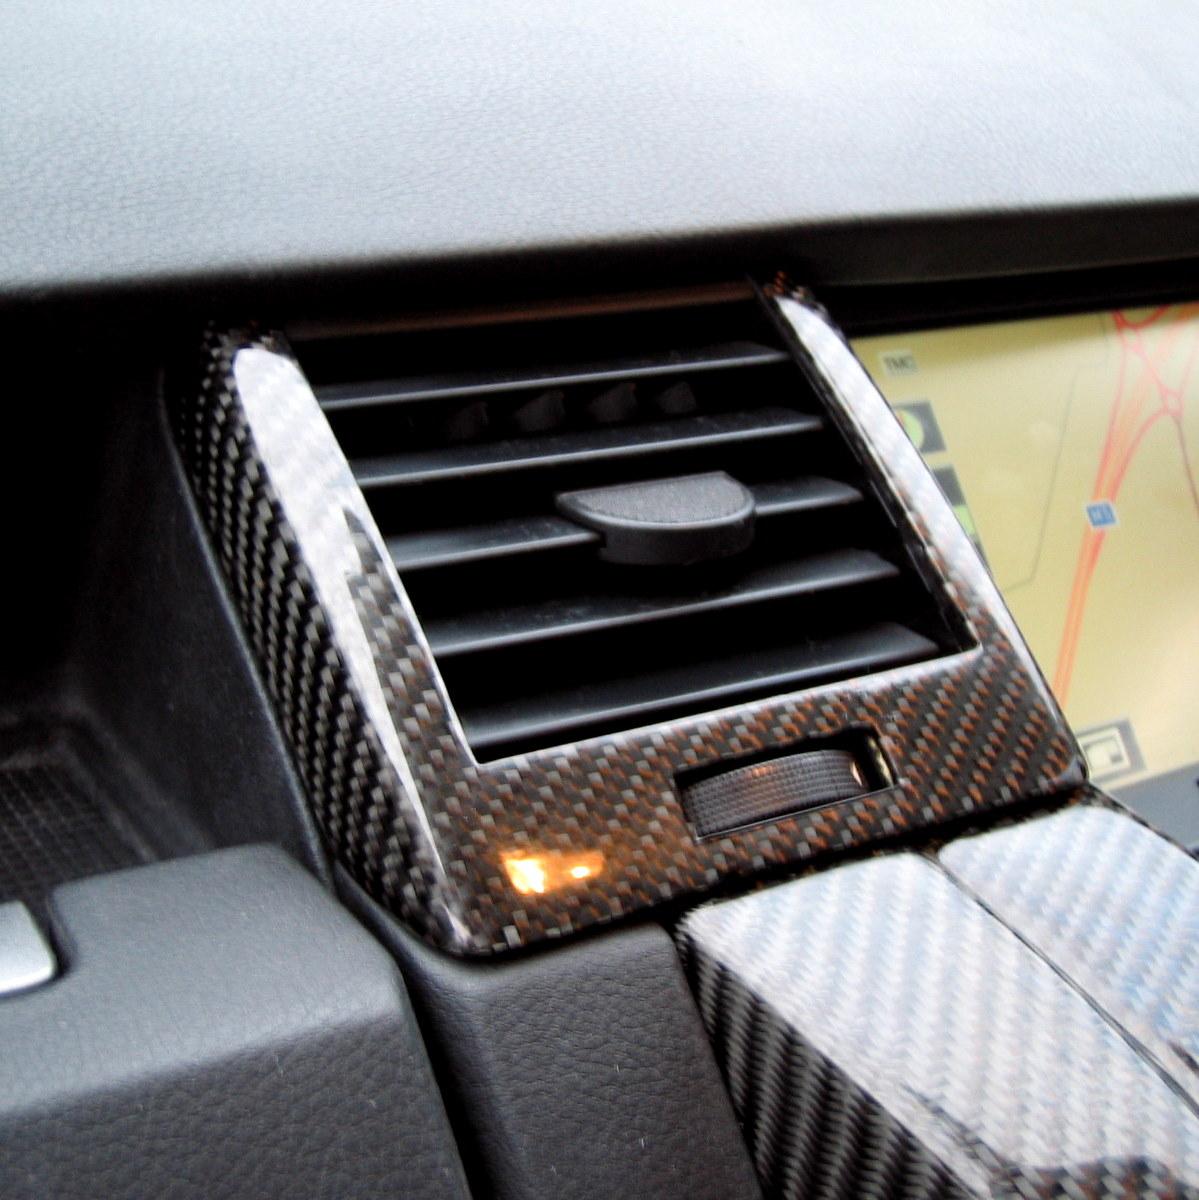 2002 Land Rover Range Rover Interior: Black Carbon Fiber Fibre Interior Dash Air Vent Kit Range